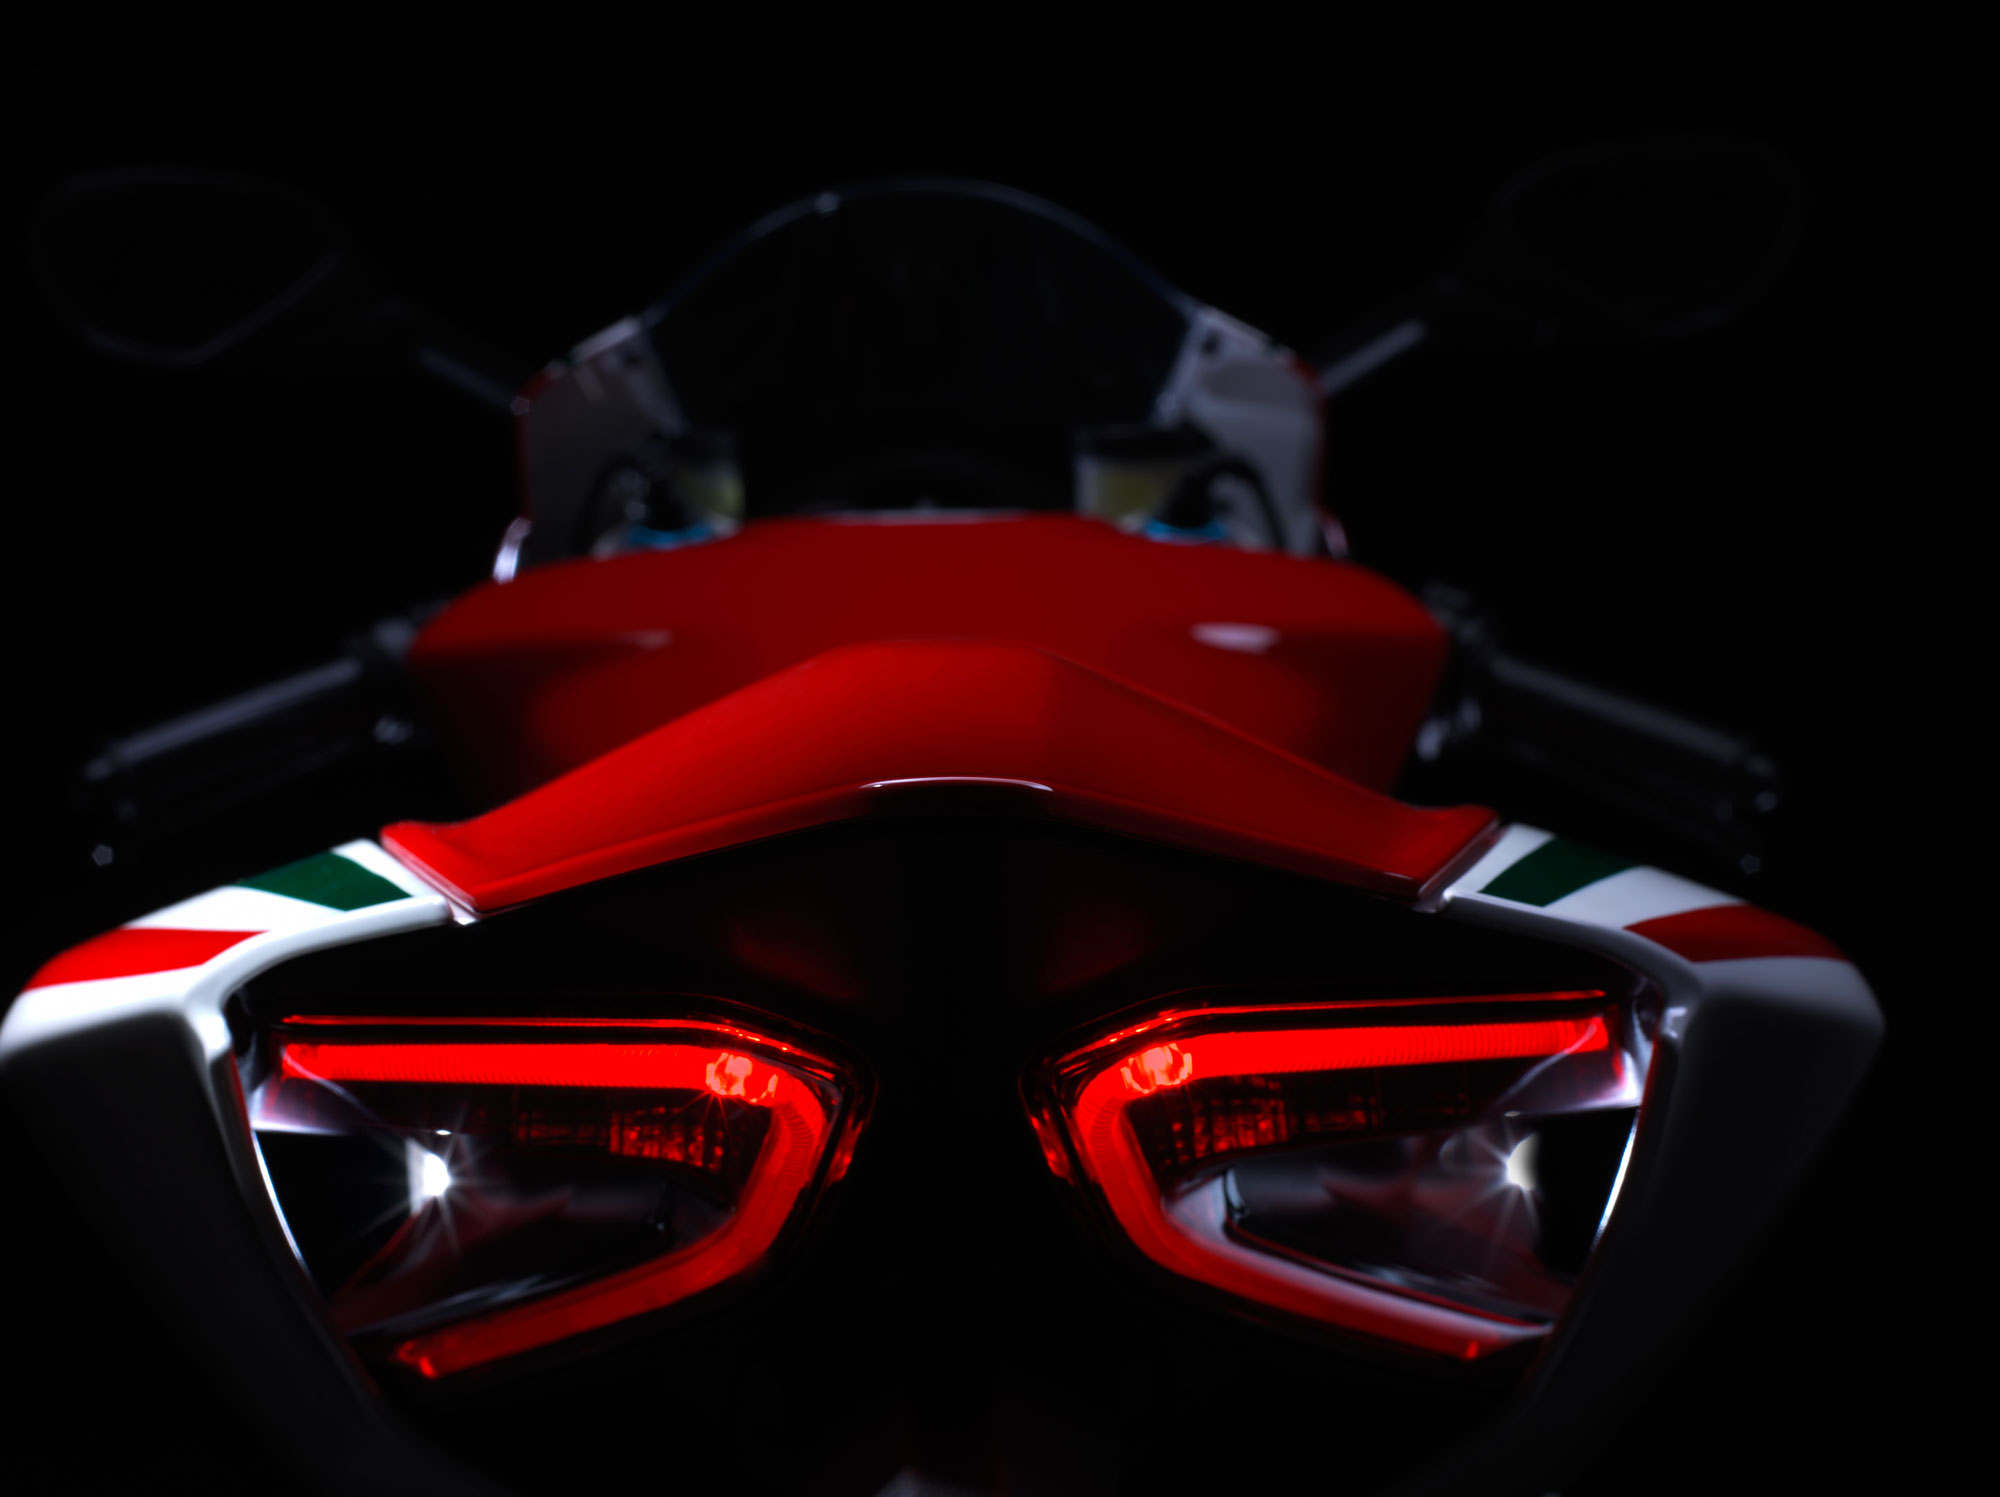 2012 Ducati 1199 Panigale S h wallpaper 2000x1497 90080 2000x1497